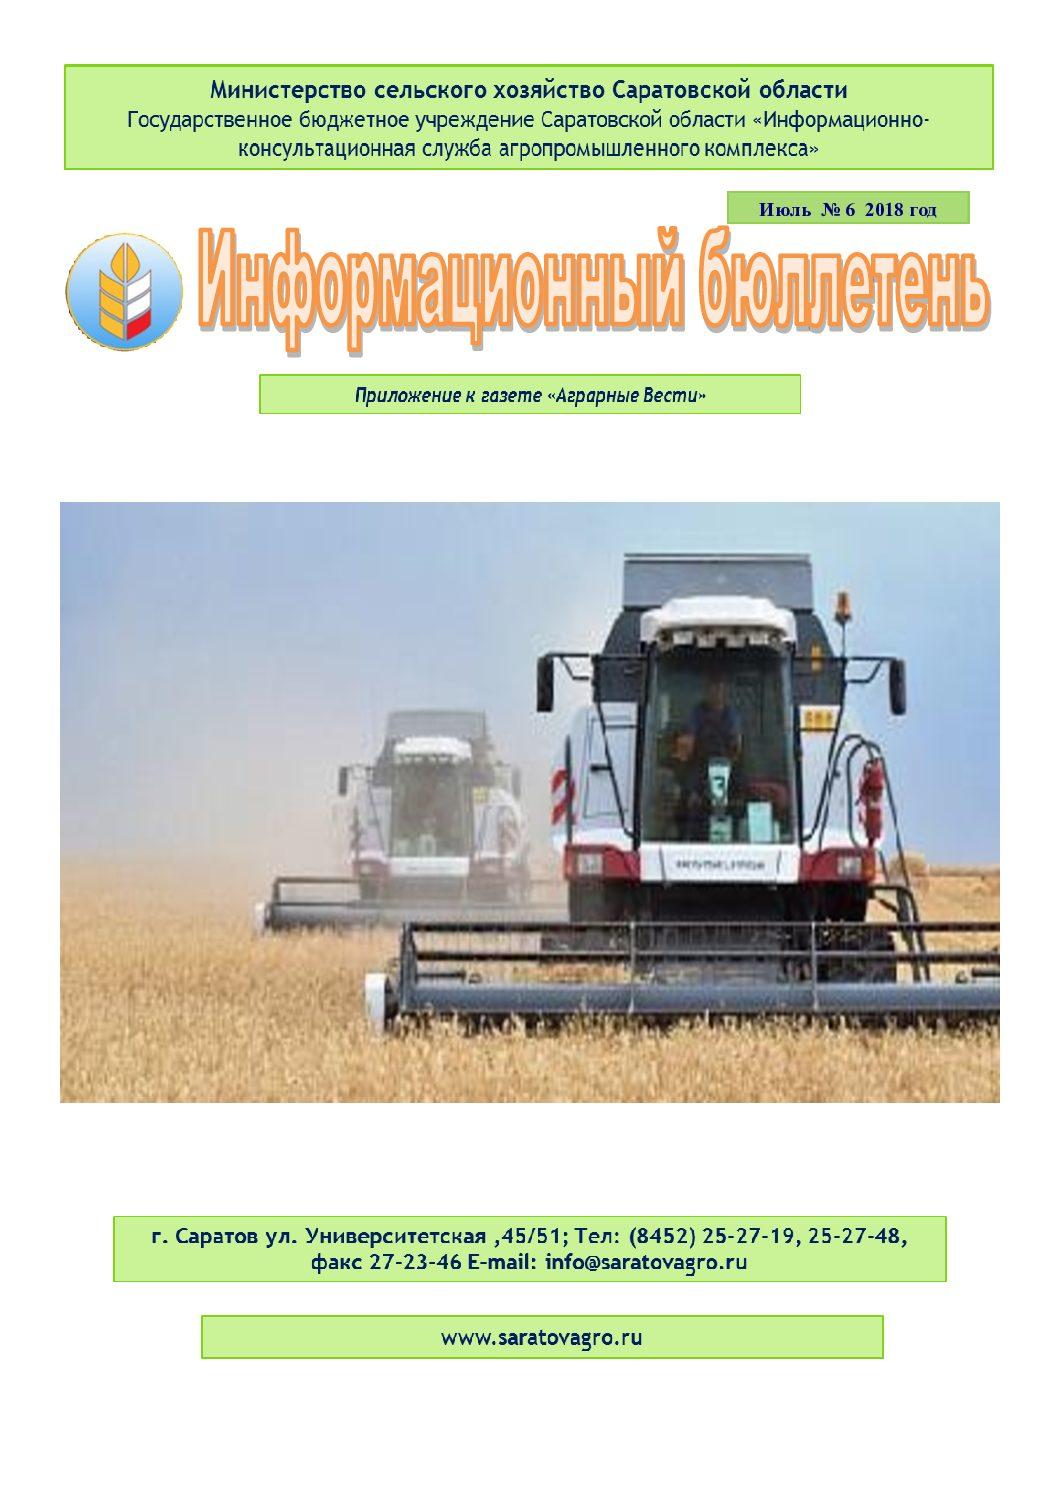 https://saratovagro.ru/wp-content/uploads/2020/08/6.2018-1-pdf.jpg